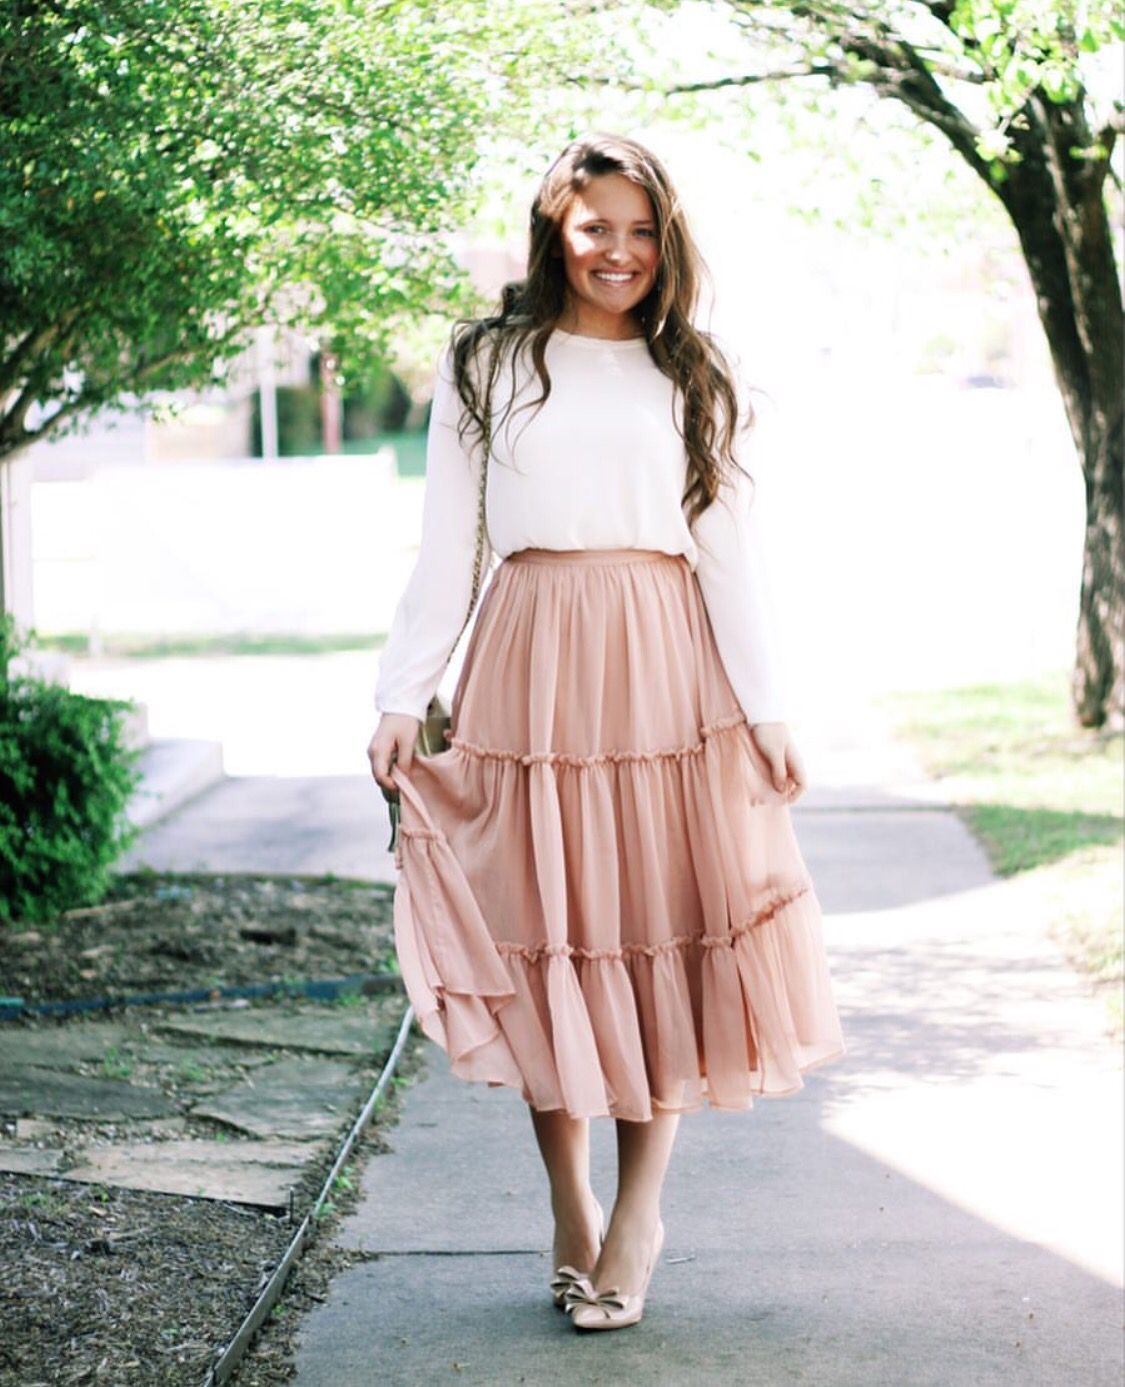 White Sweater | Gathered Skirt | Rio-Rita Skirt | Simple Outfits | fashion | Pinterest ...